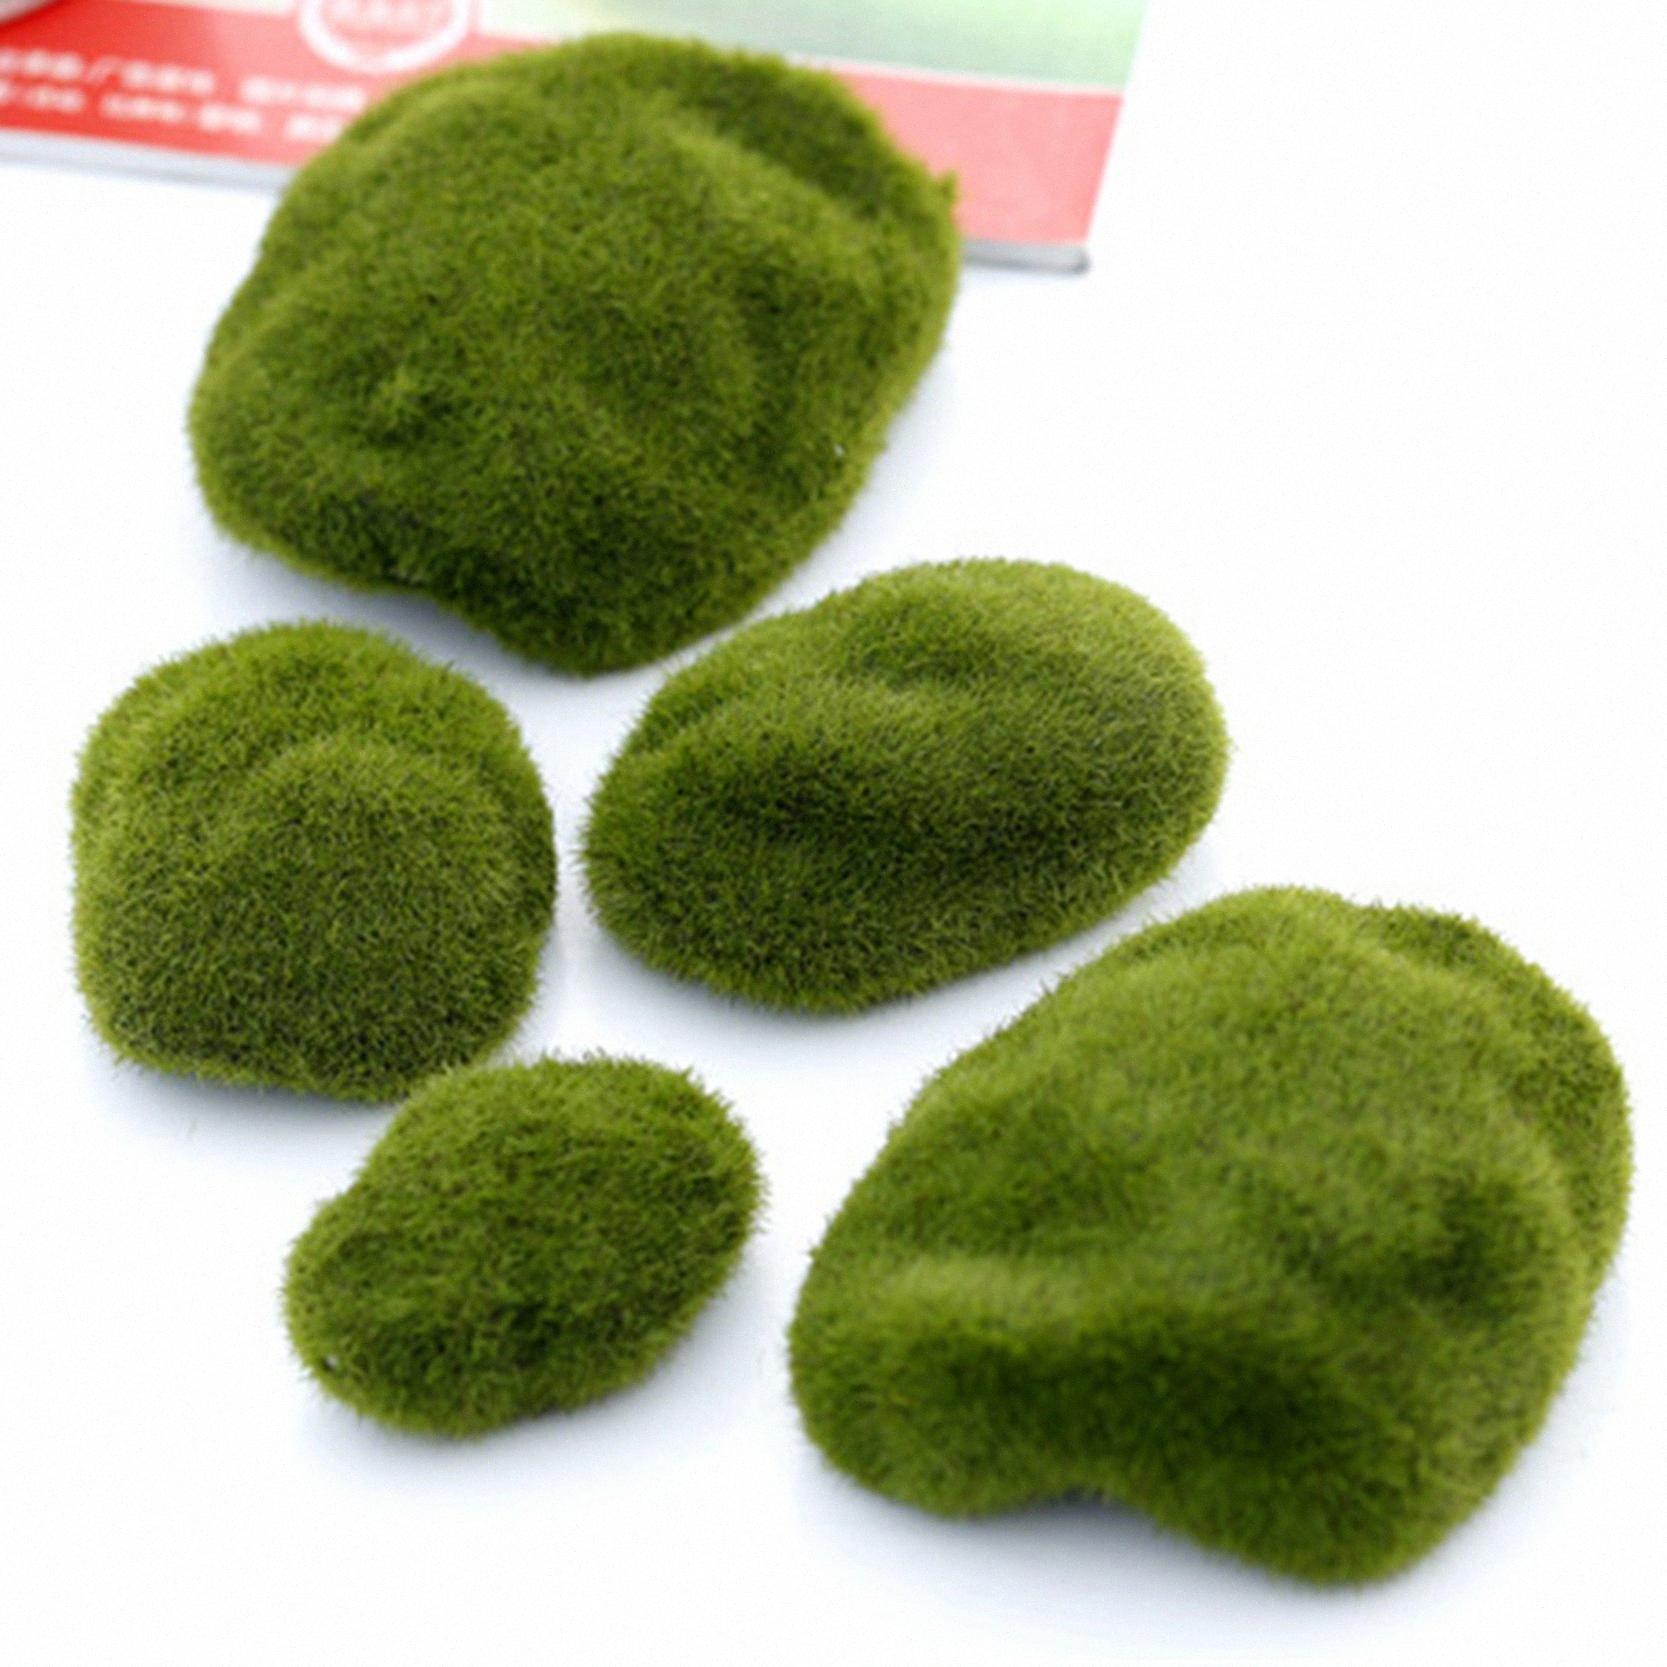 Atacado 3 pcs verde Natural Moss Artificial Crafts decorativa Micro Landscape Ornament Início Bonsai Suculenta Gnomes Miniature PiQh #